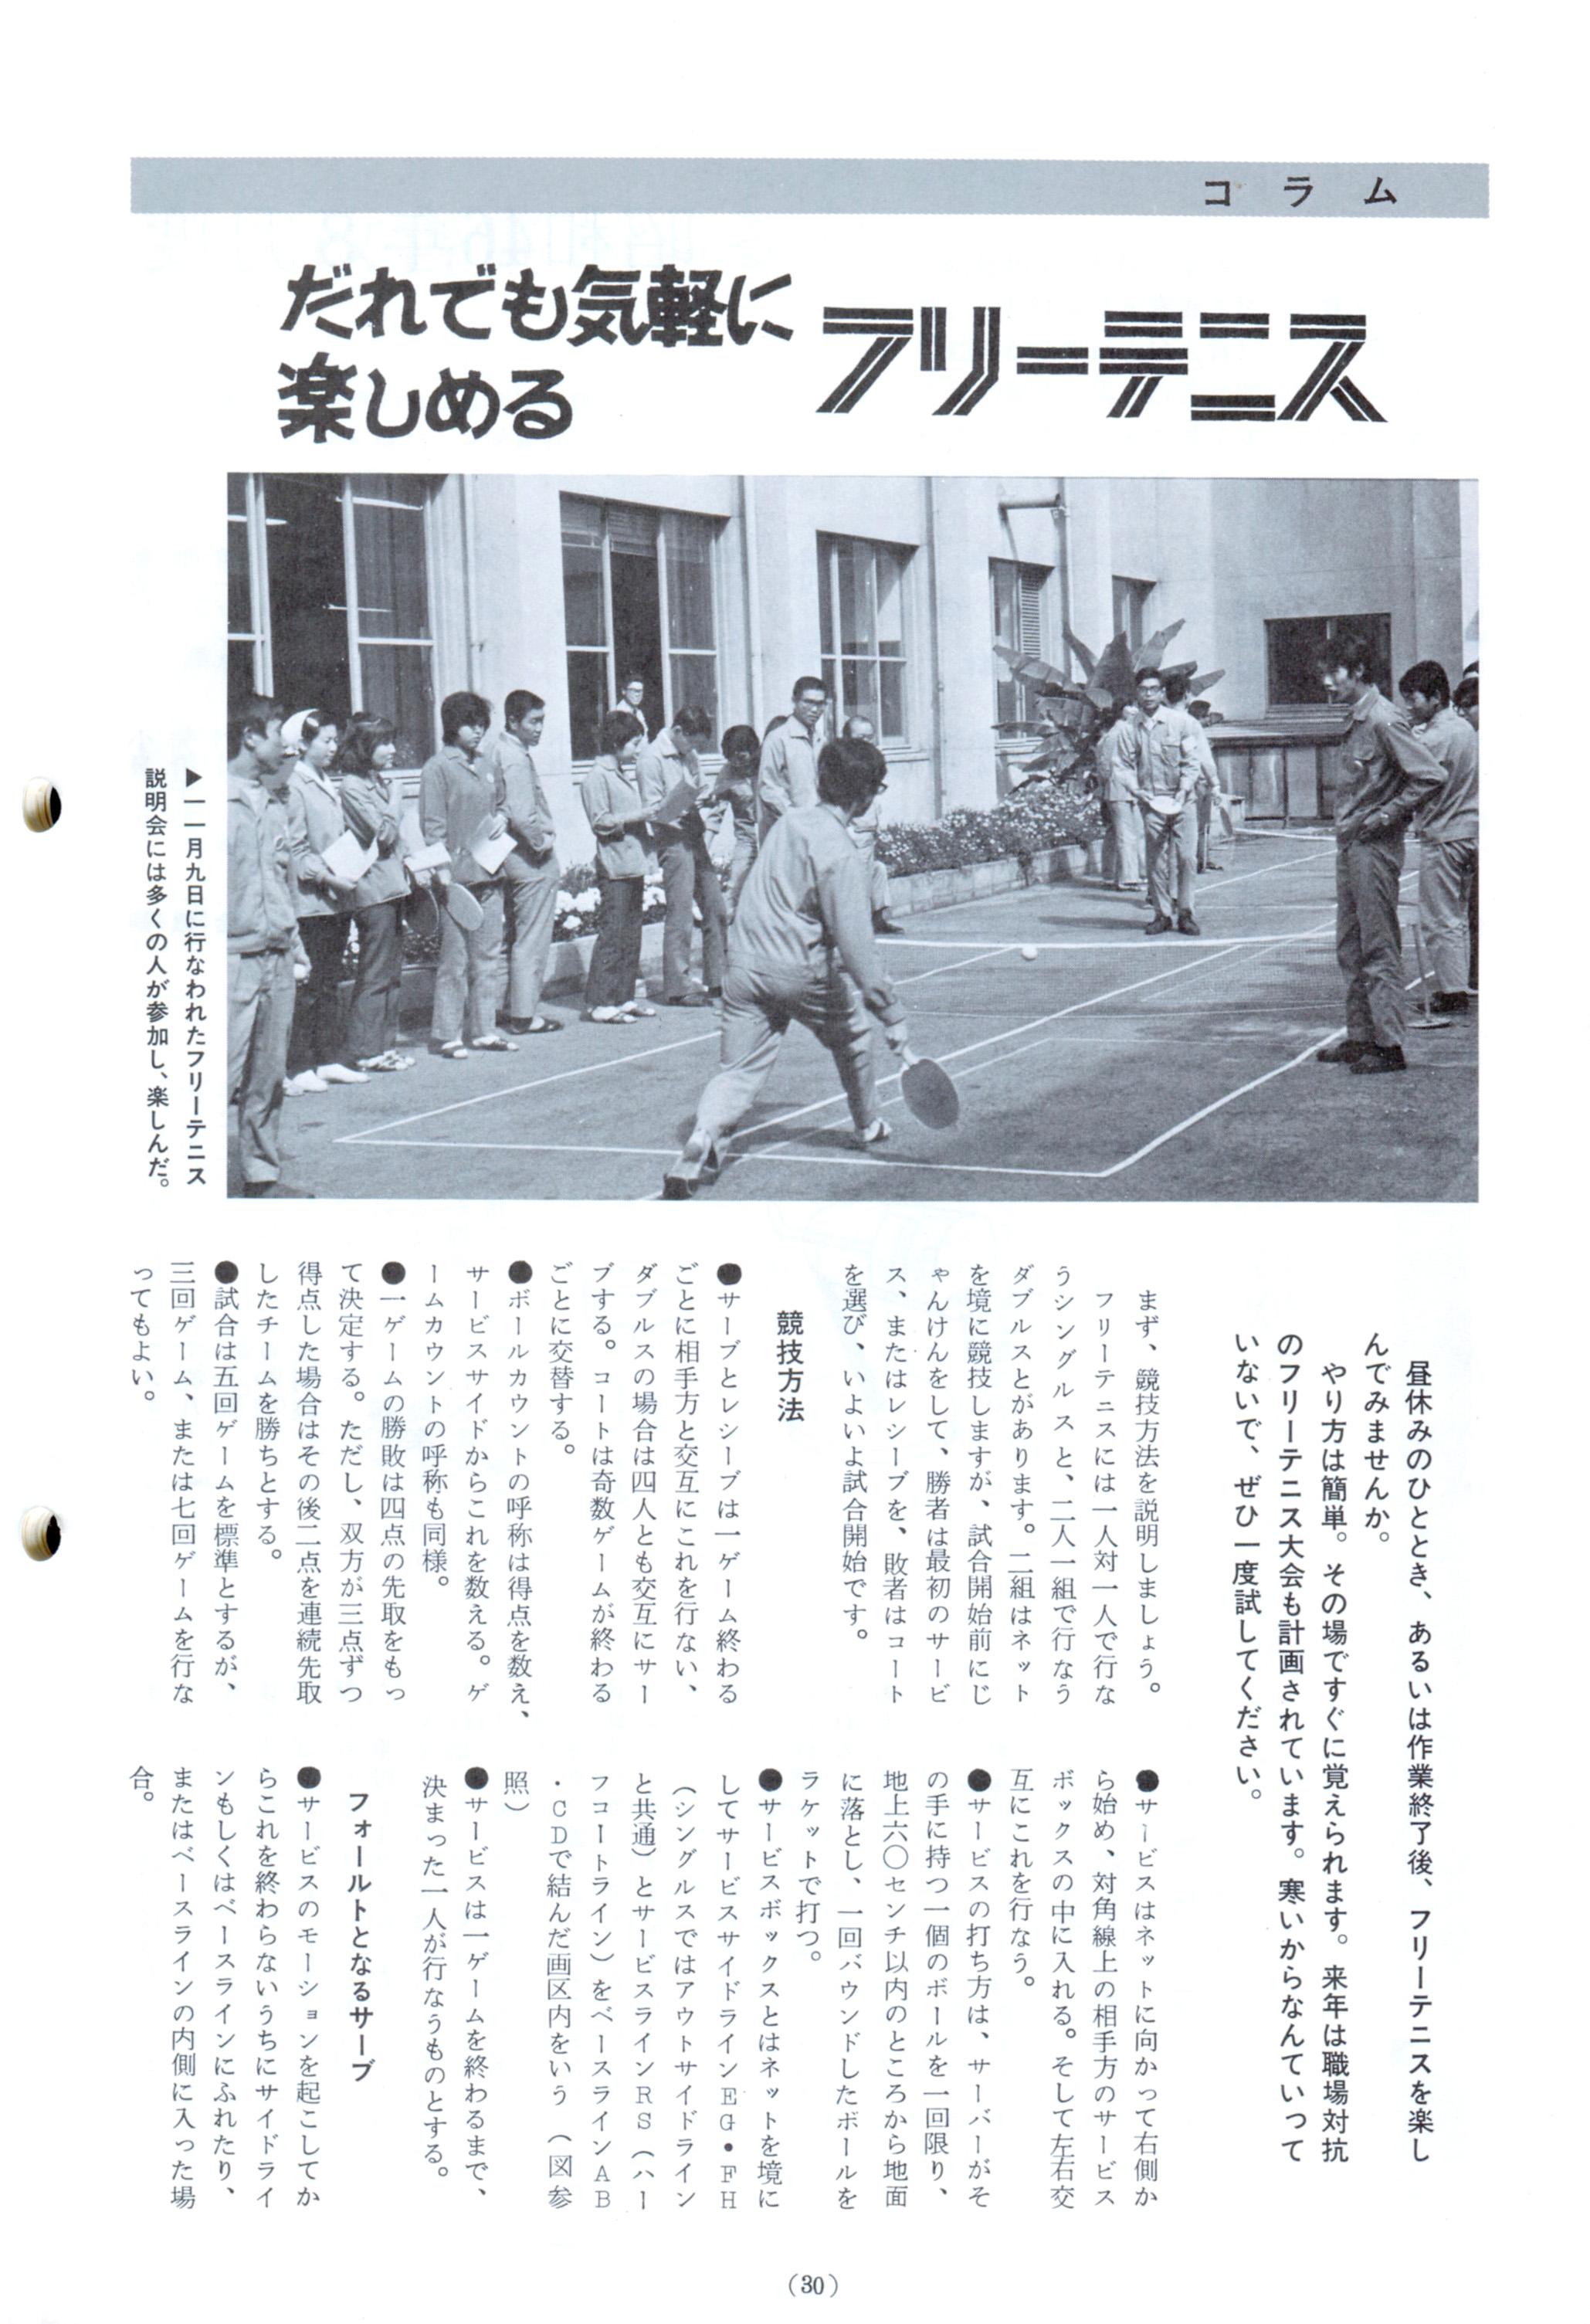 Example Page 3 - 1971 No.11